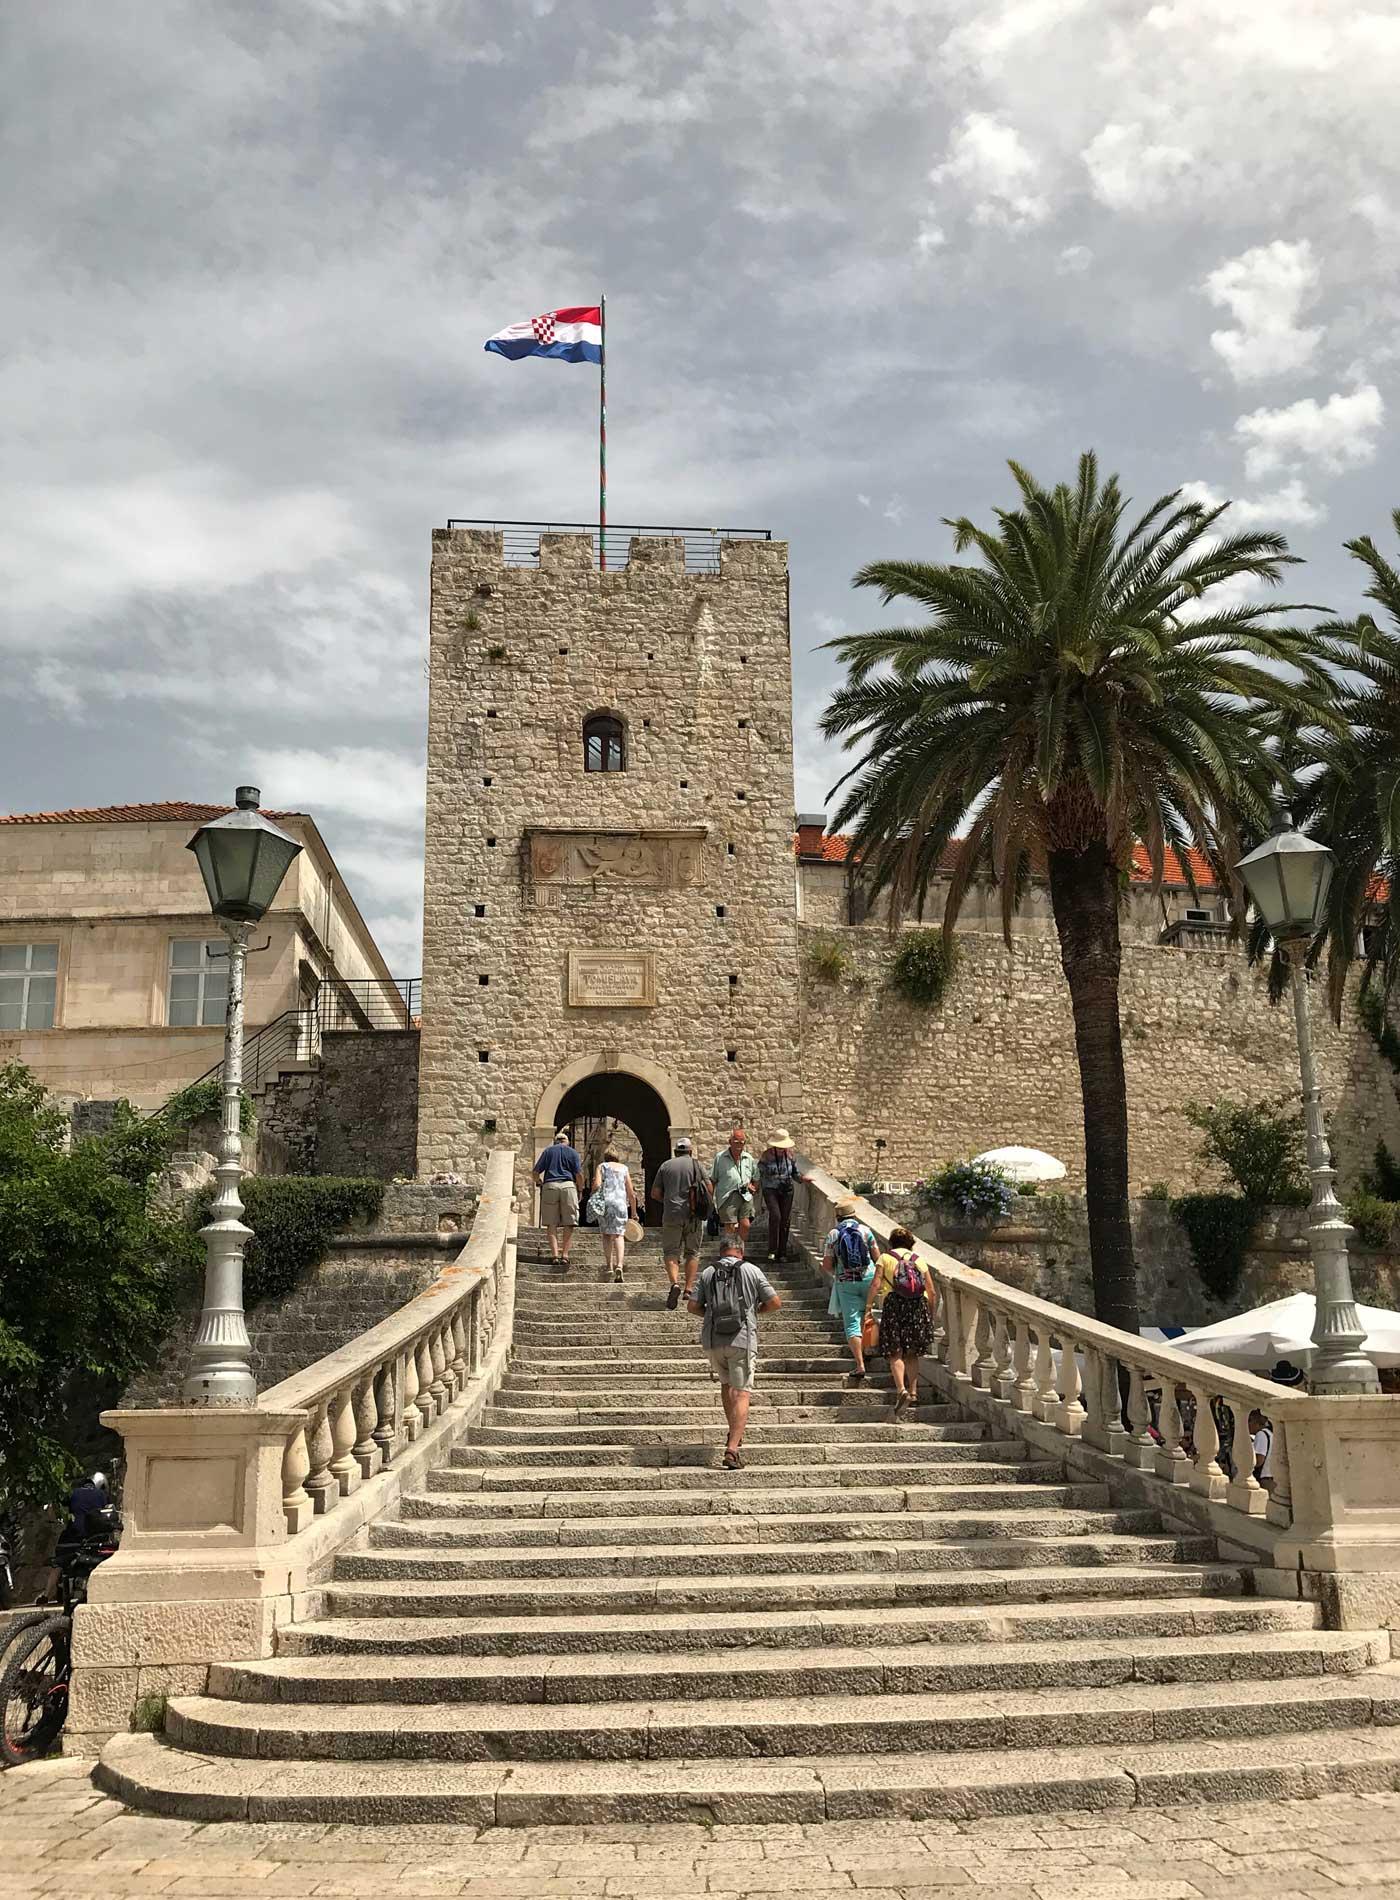 Korcula-Curzola-Croazia-Torre-de-Revelin-porta-di-terra-palma